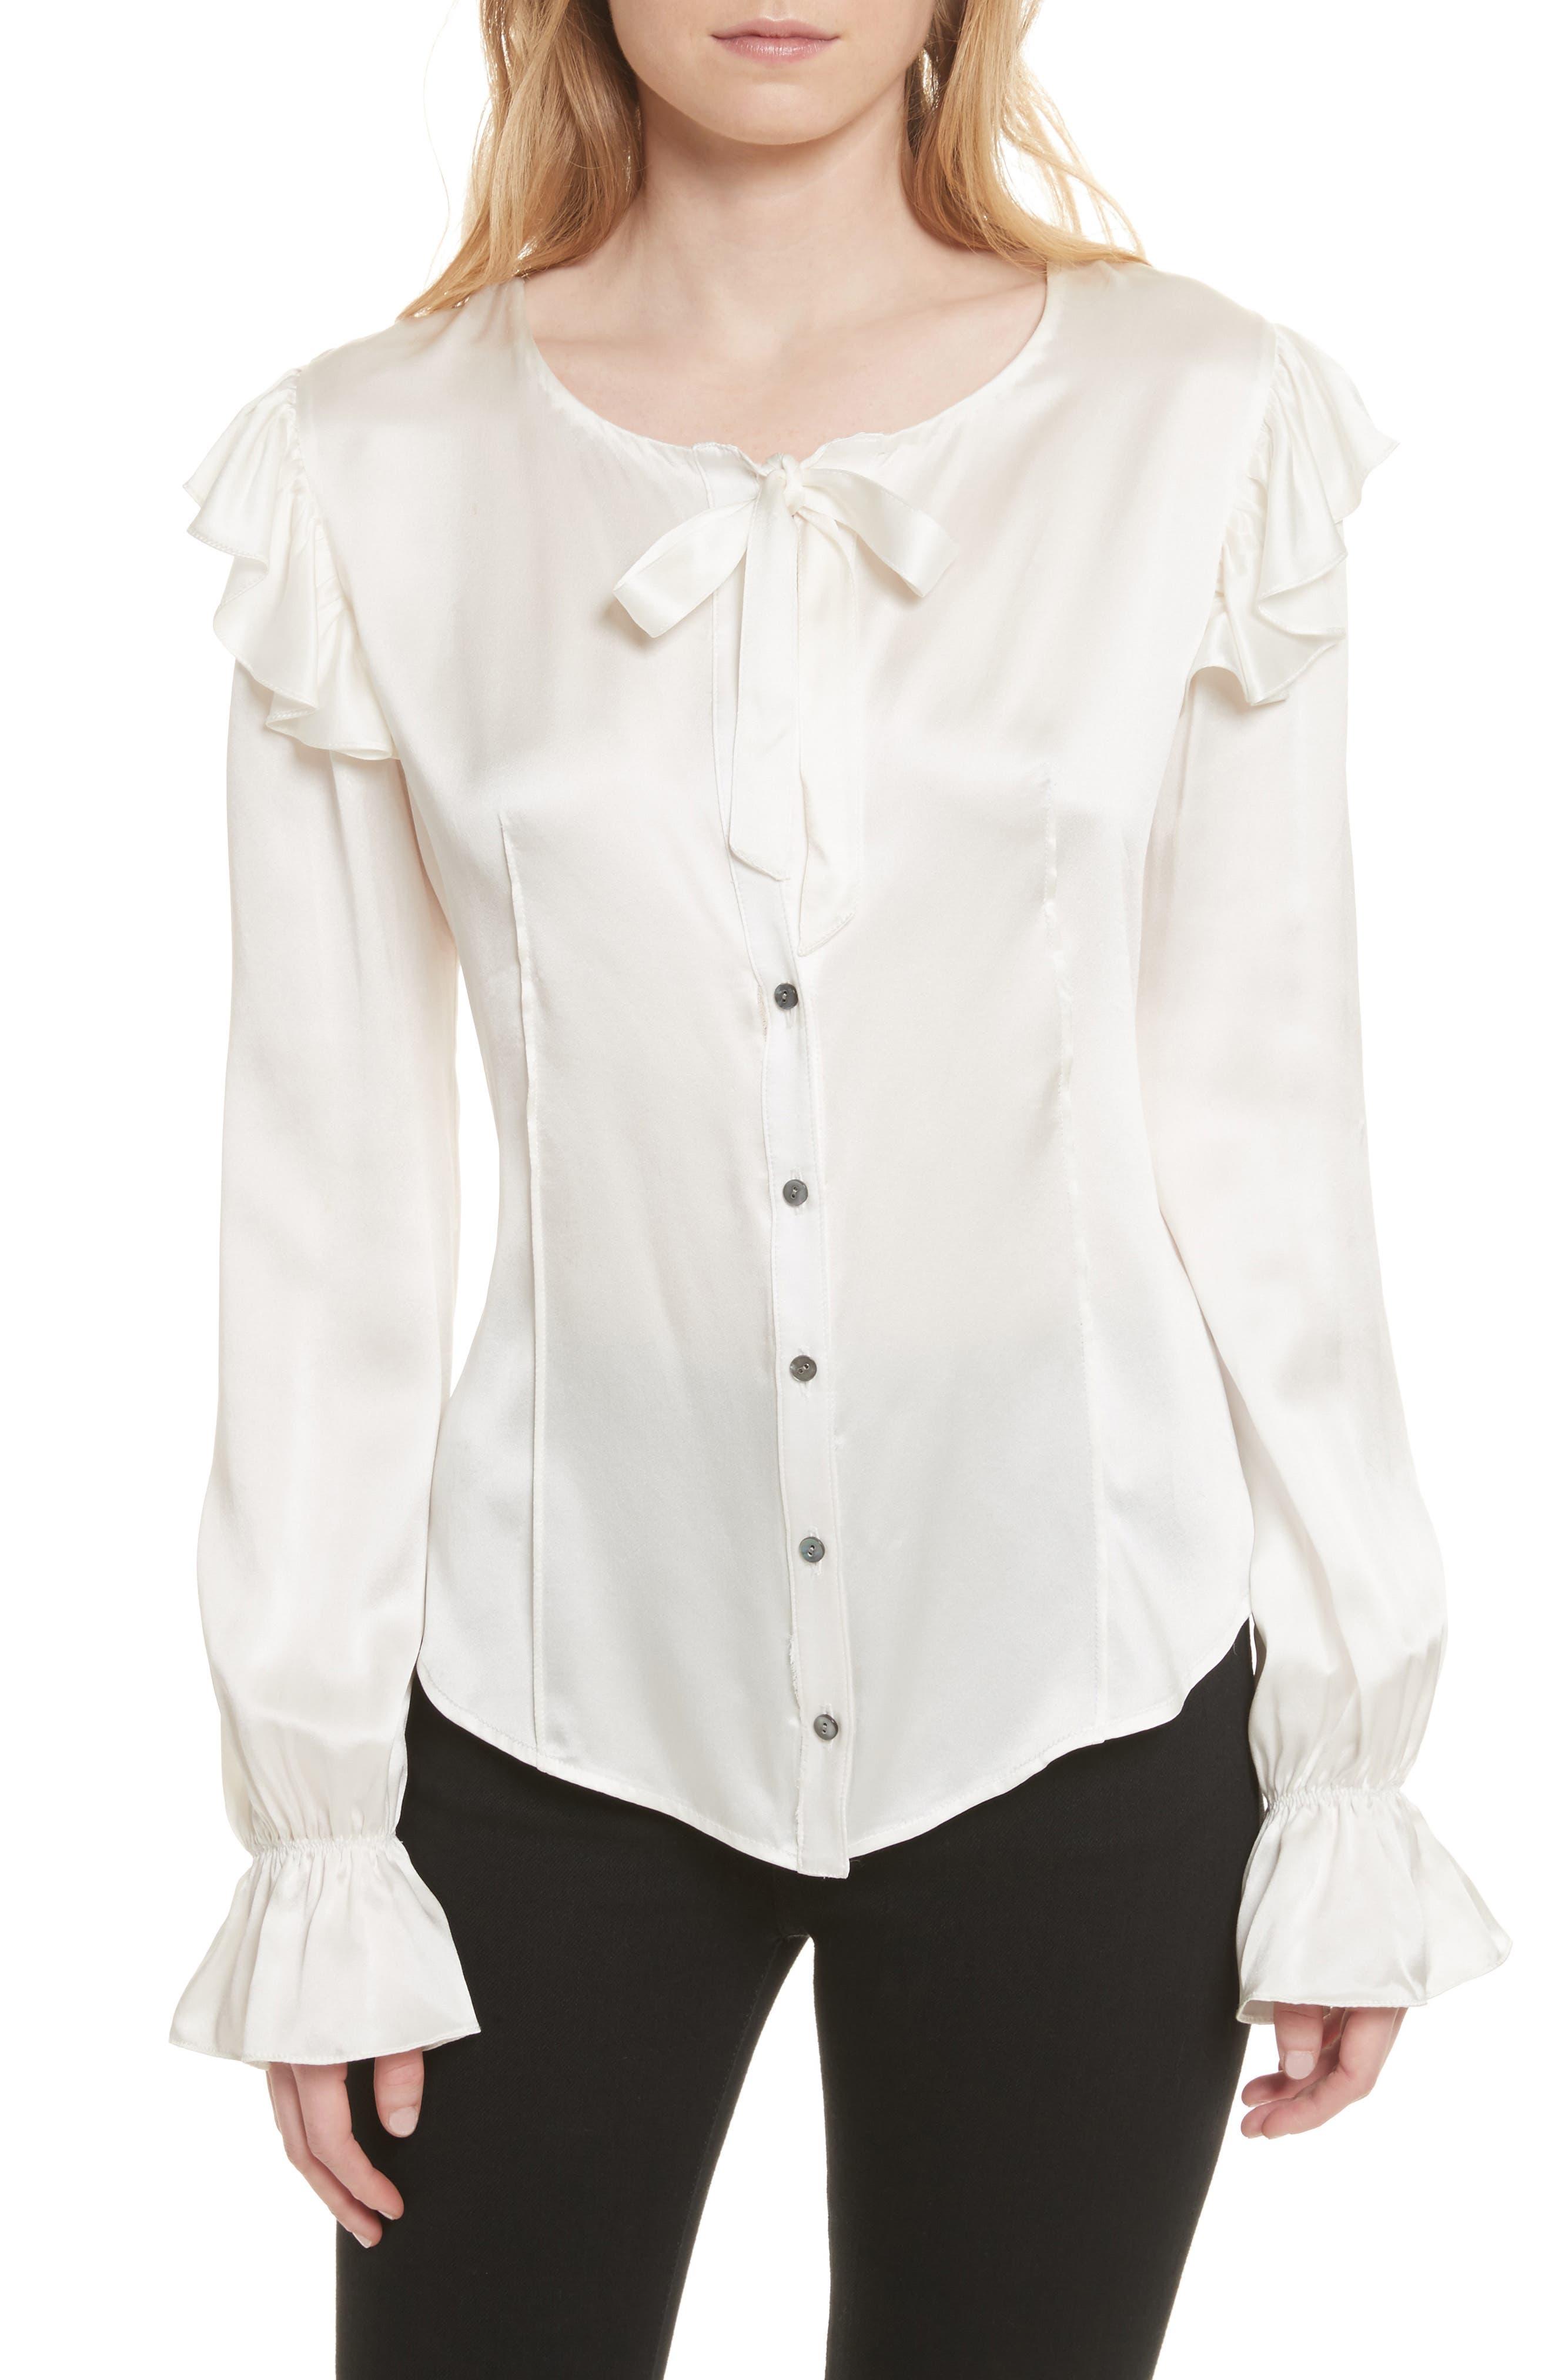 Alternate Image 1 Selected - Cinq à Sept Cassanova Tie Neck Silk Blouse